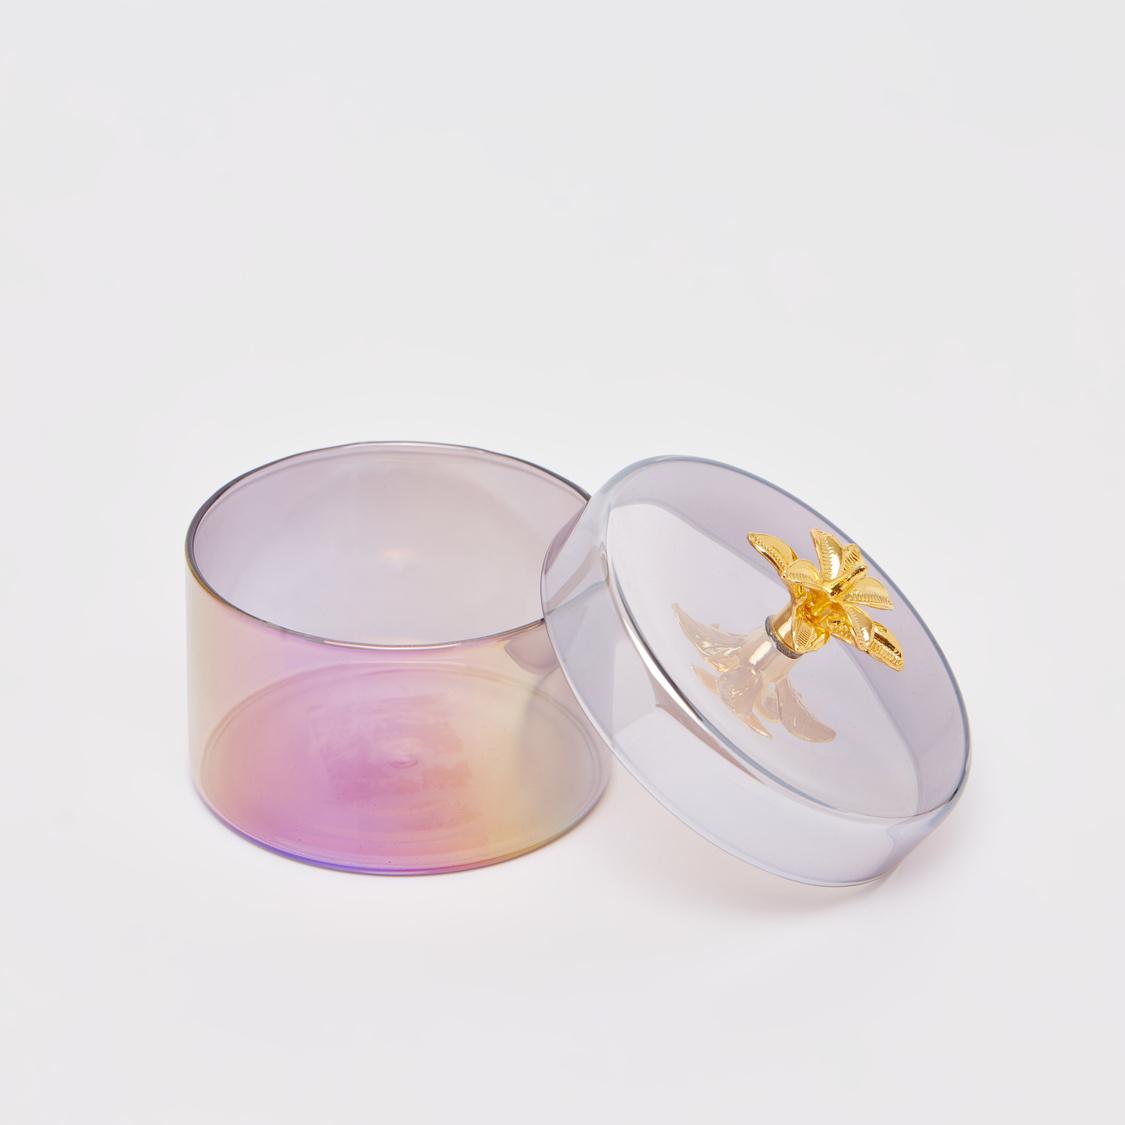 Decorative Jewellery Box with Lid 9.5x8 cm